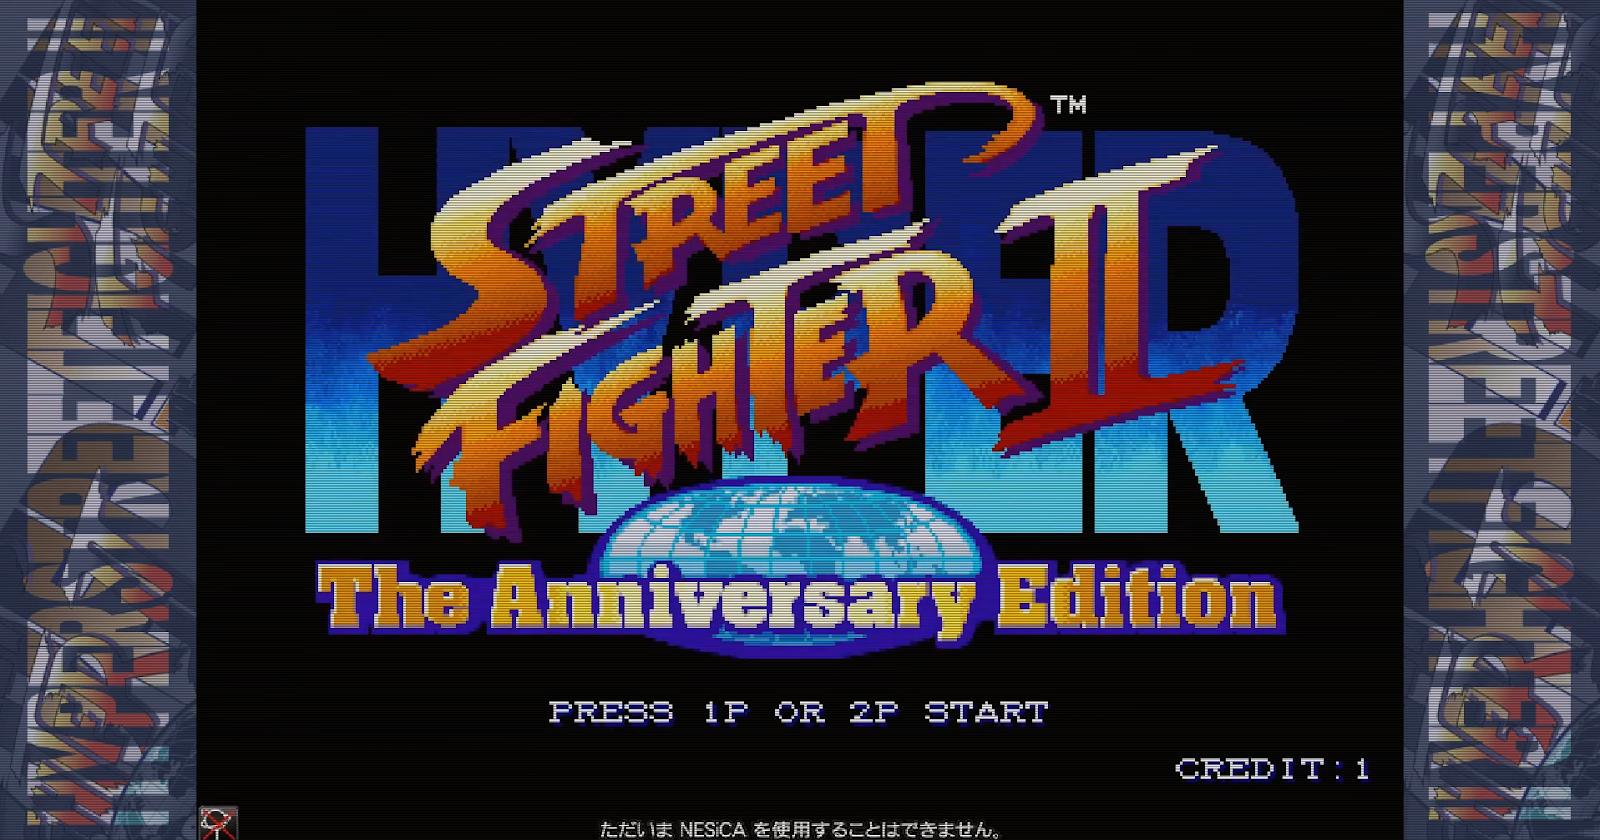 Hyper Street Fighter II The Anniversary Edition Arcade Dump